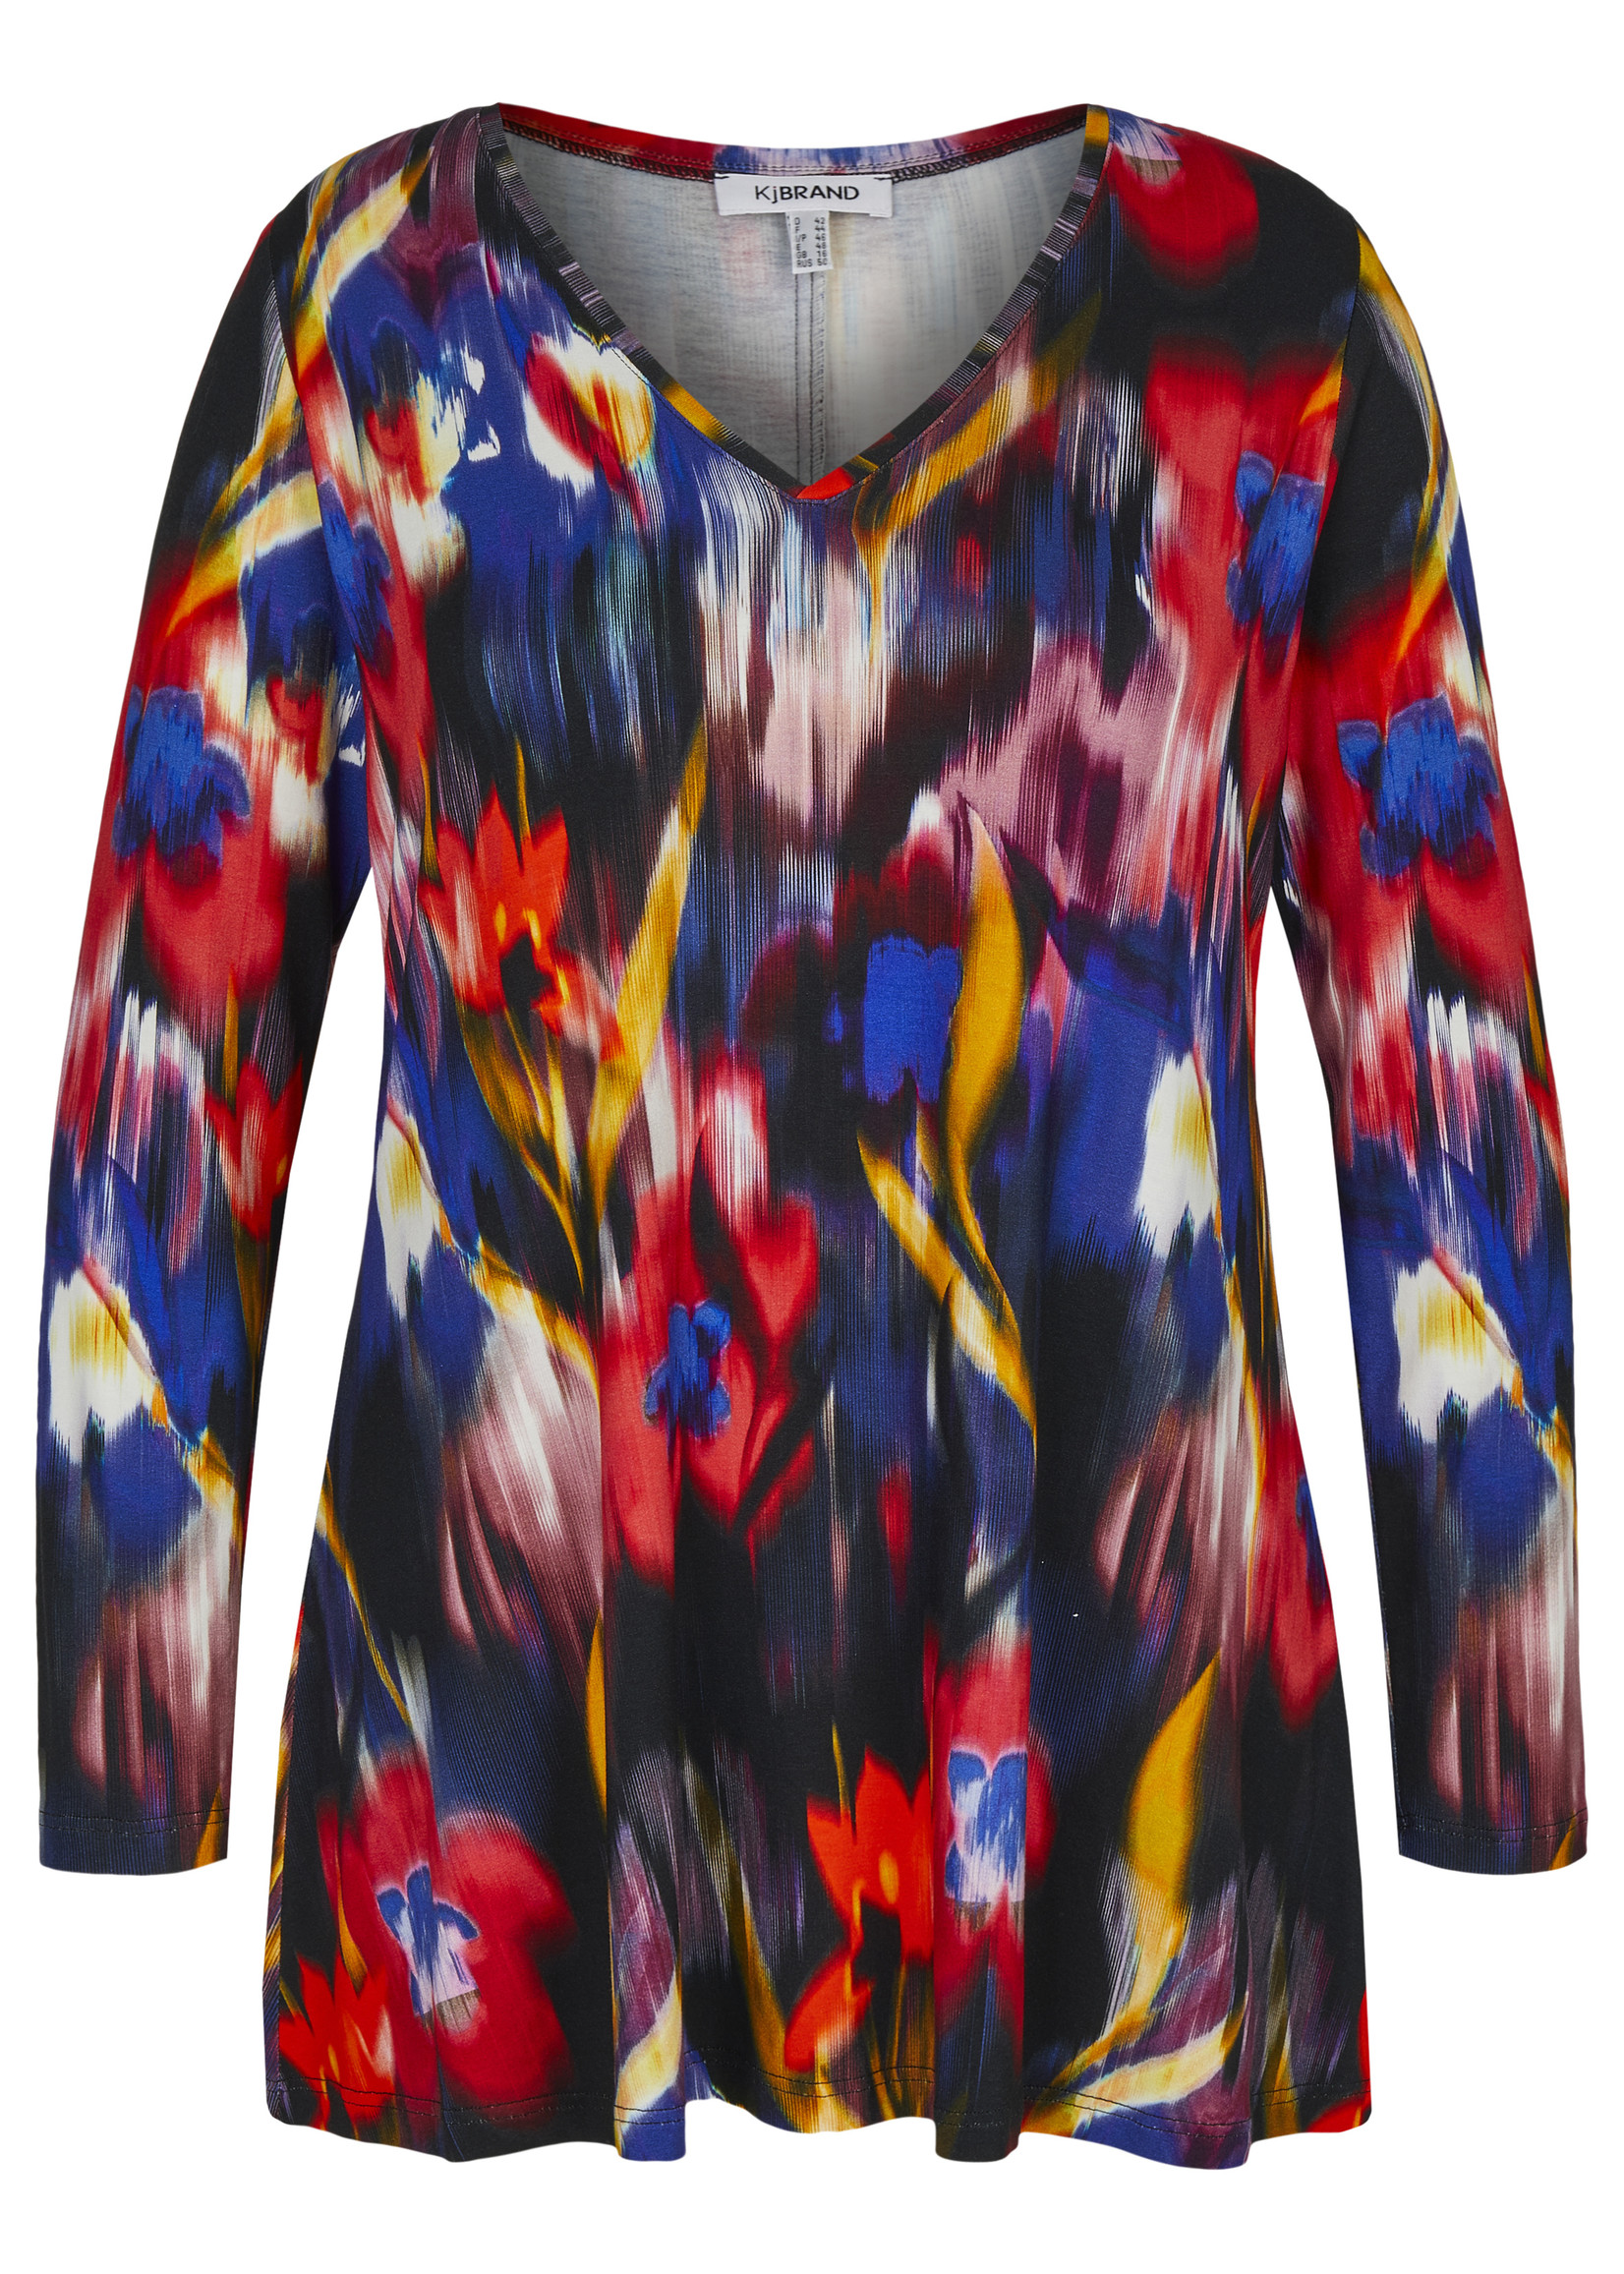 KJBrand Shirt V-hals, rode bloem